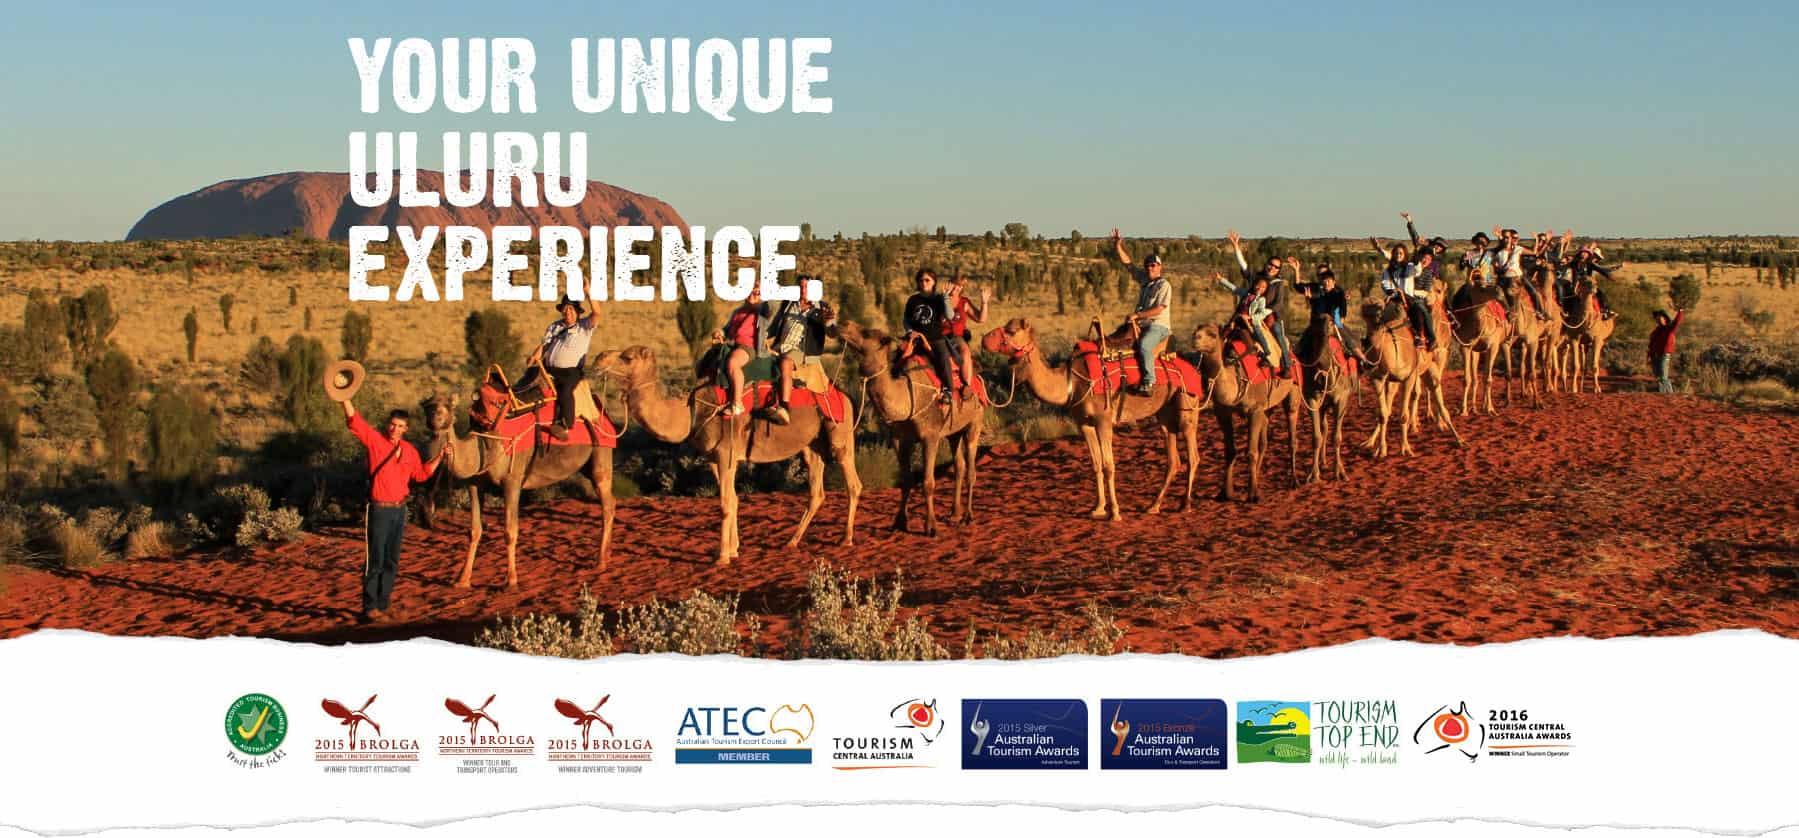 Uluru Camel Tours Your Unique Uluru Experience